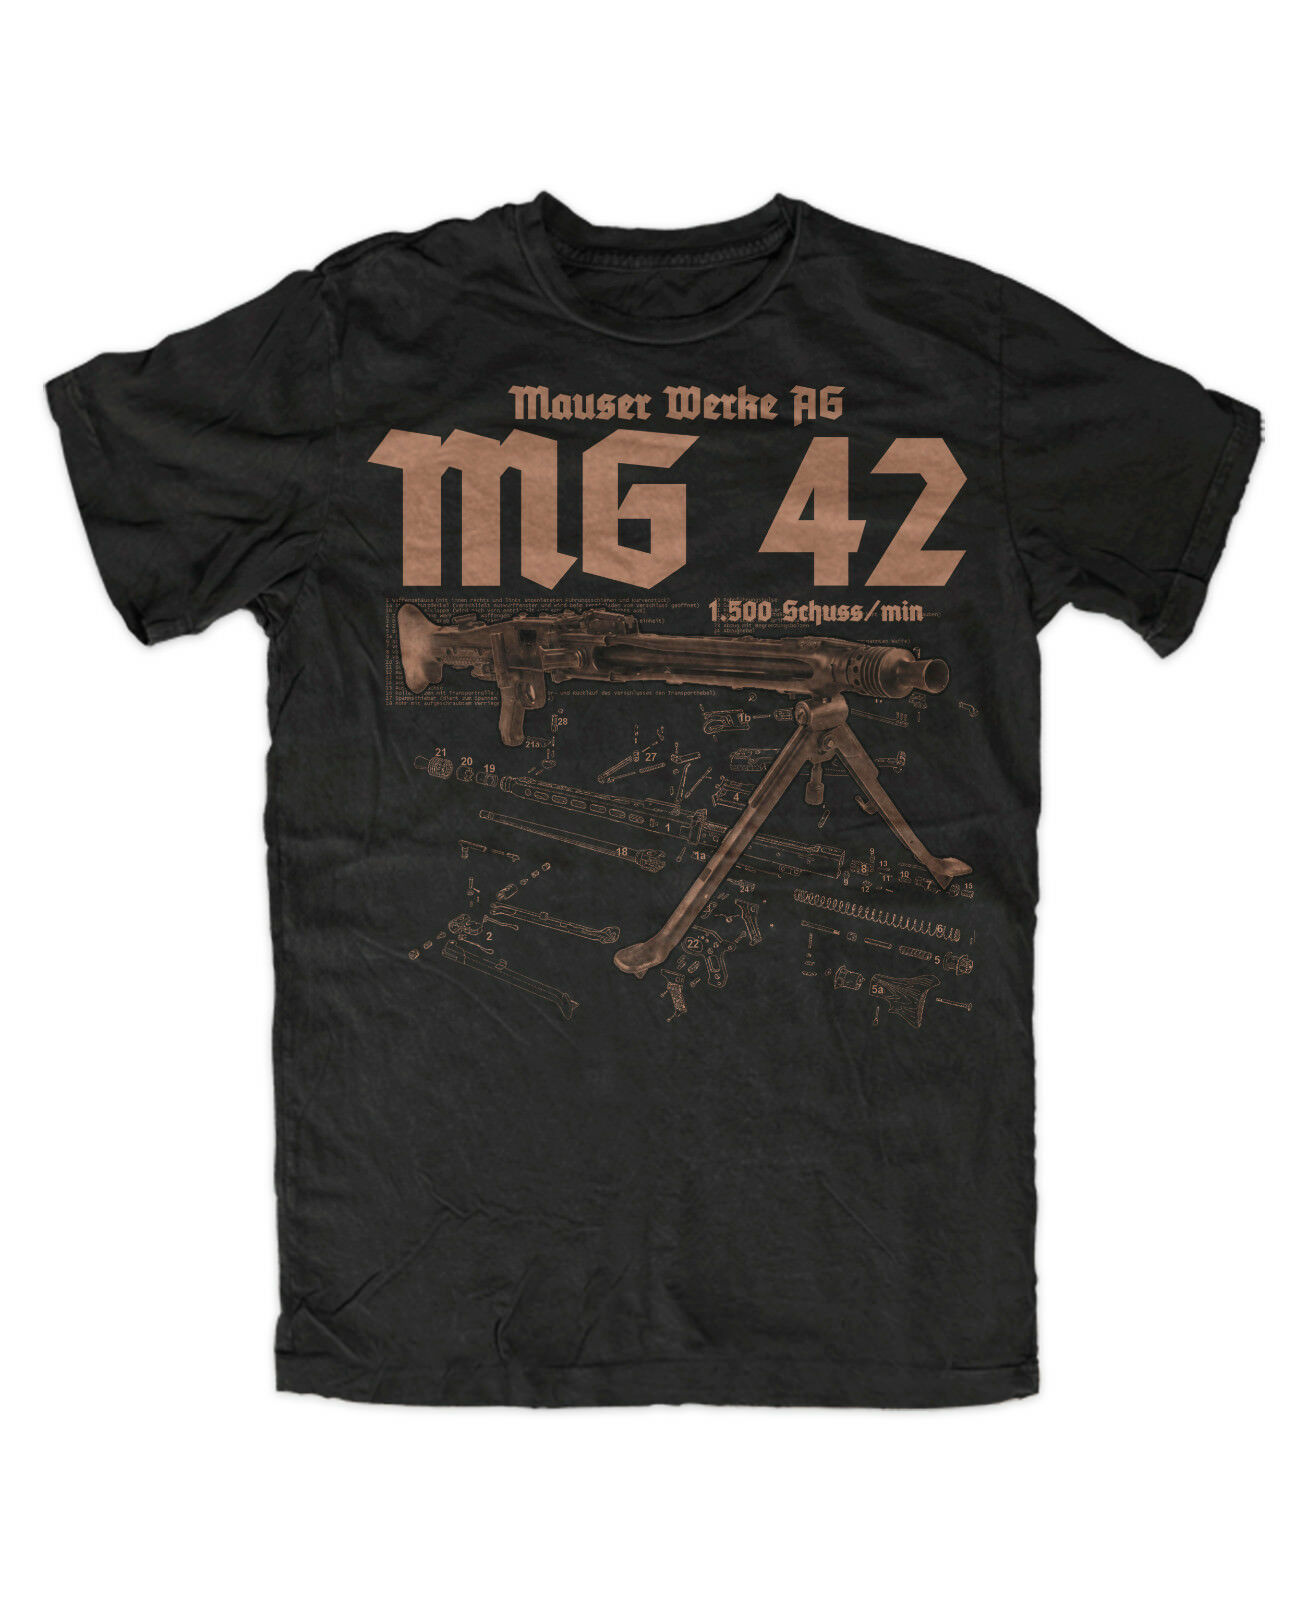 Mg 42 Premium T-Shirt Mp 40 , Mp44 , Armee , Tactical T-Shirt Unisex Tees